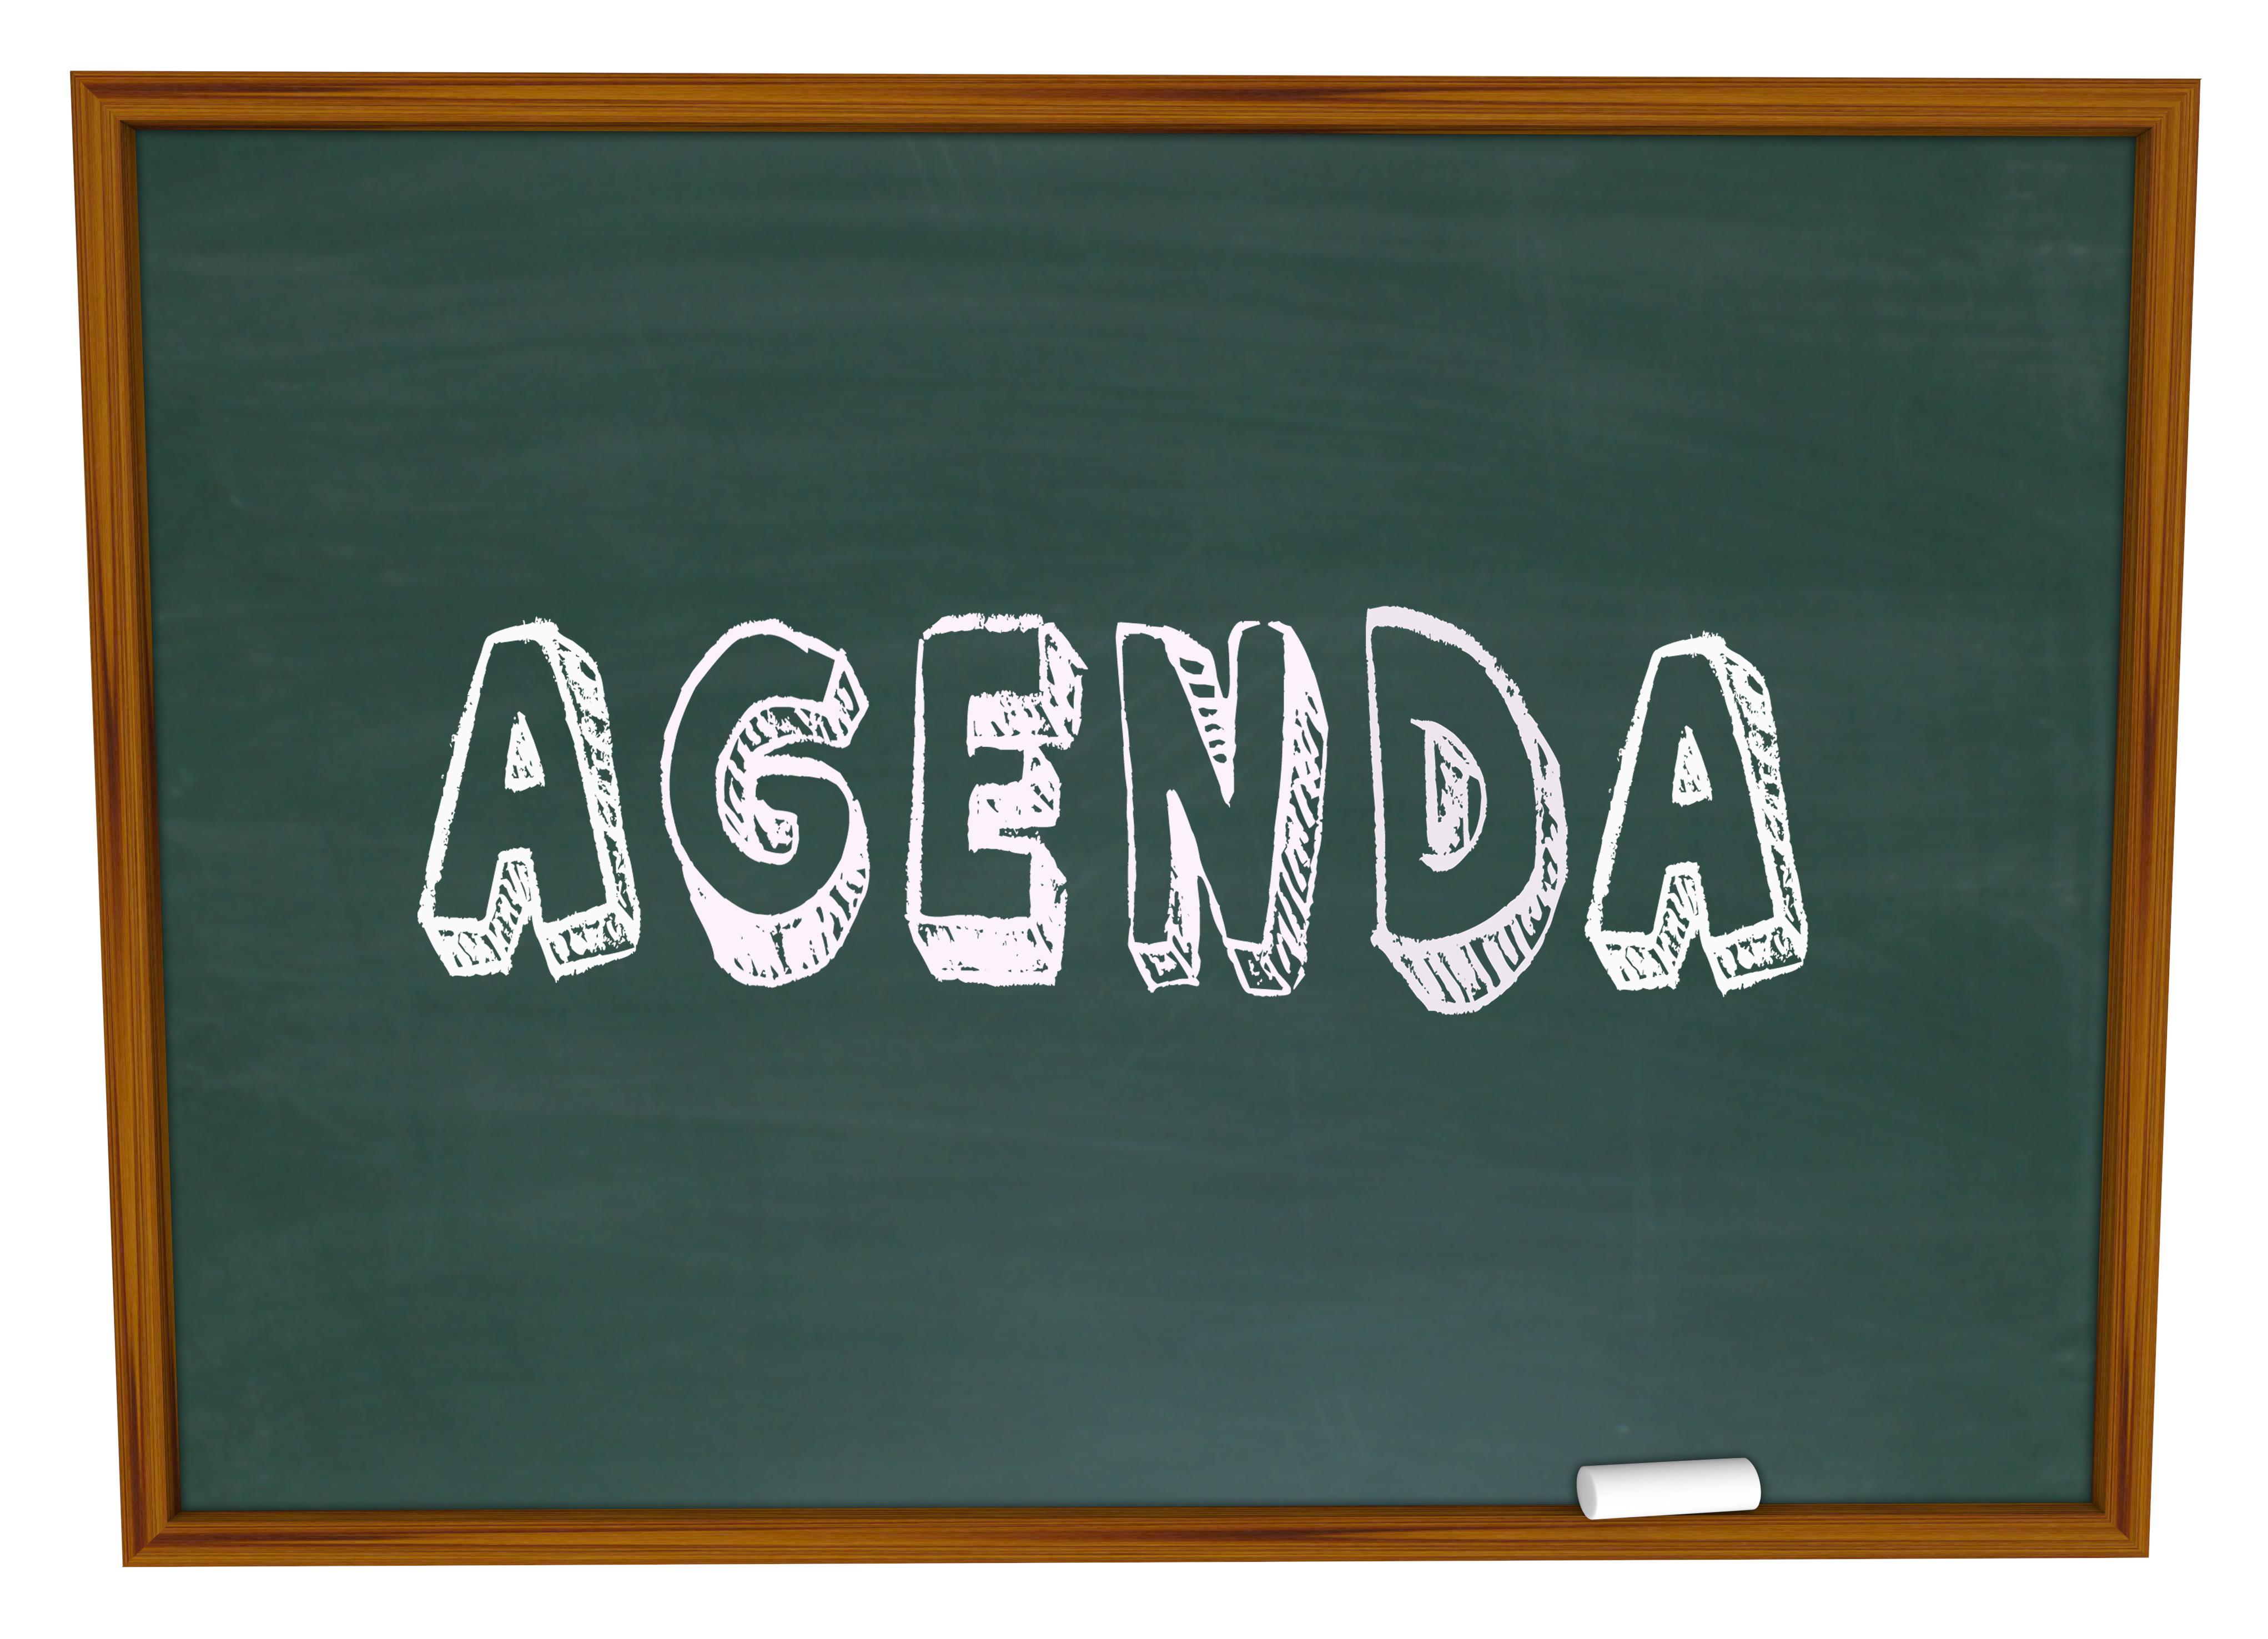 daily school agenda chalkboard